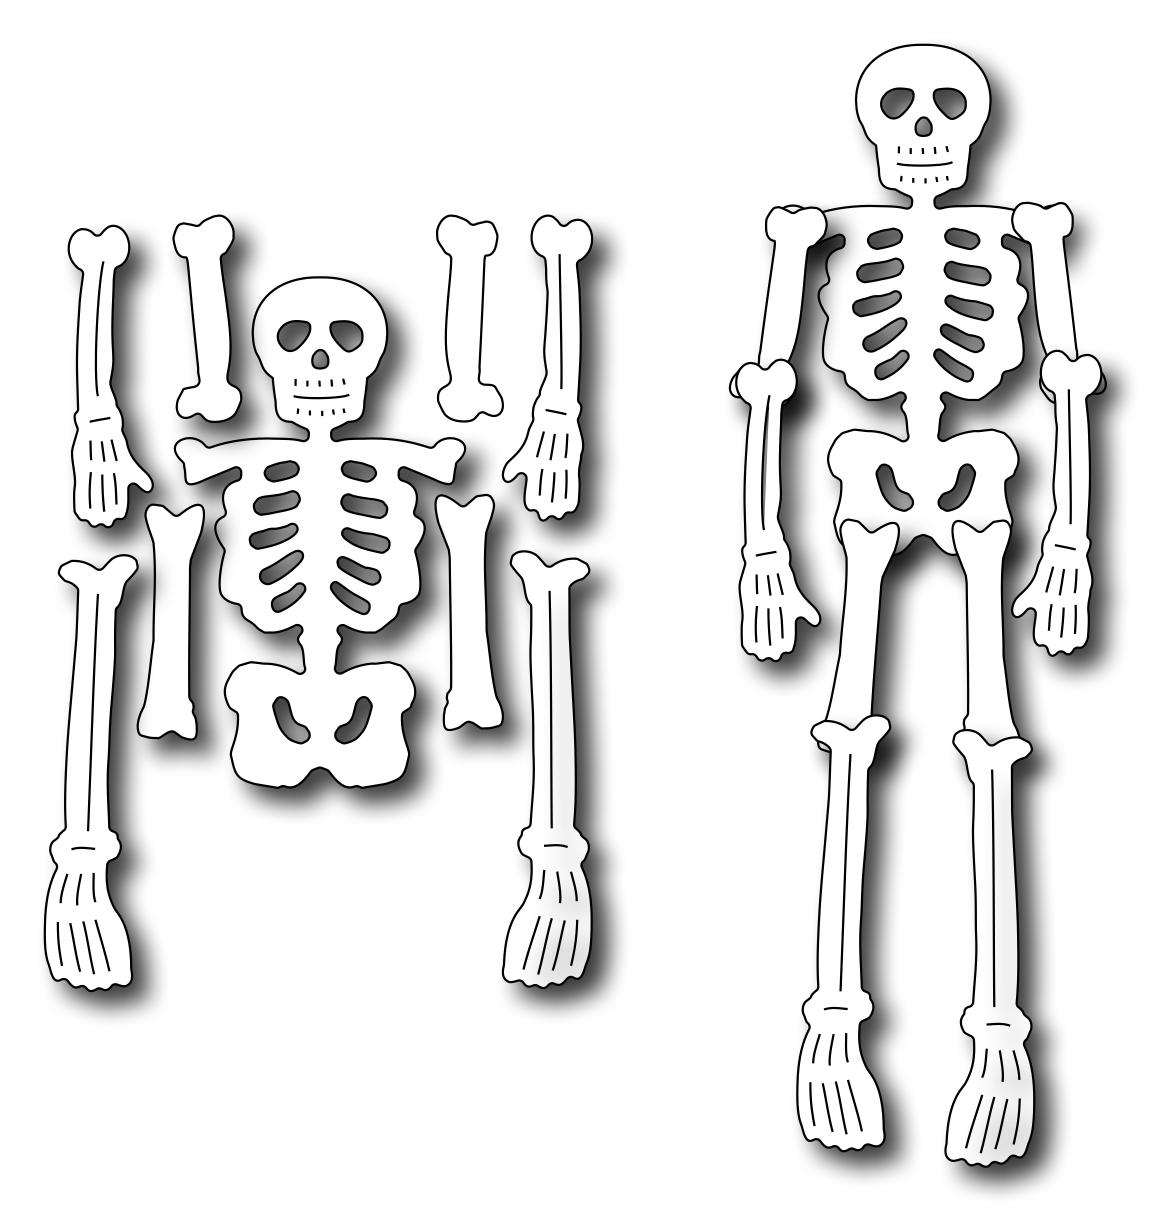 учетом скелет шаблон картинка перекатится